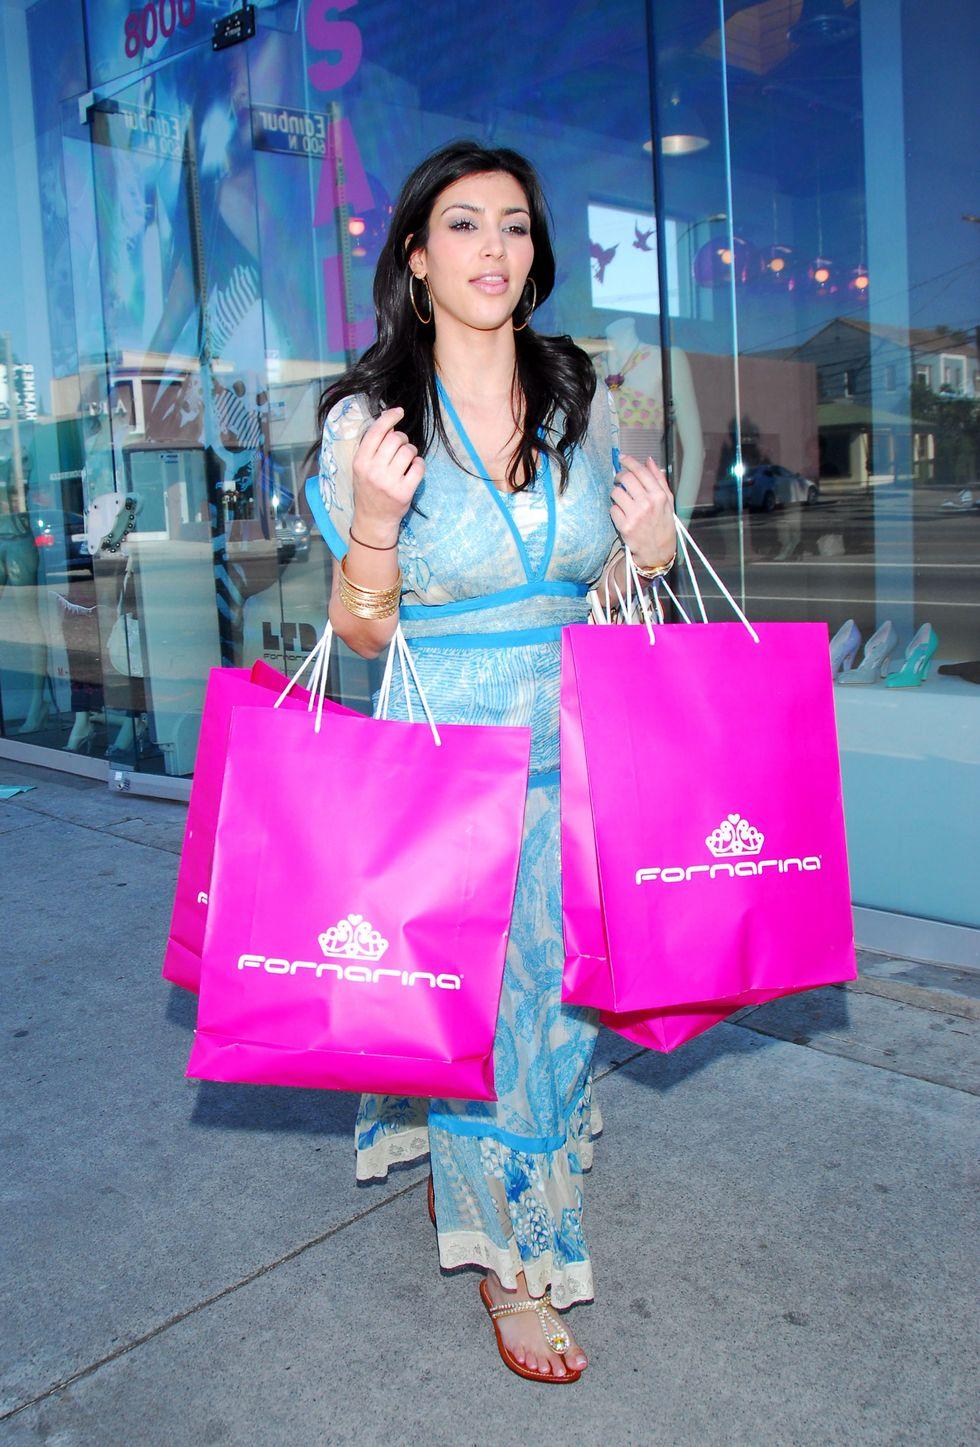 kim-kardashian-at-fornarina-boutique-on-melrose-avenue-06